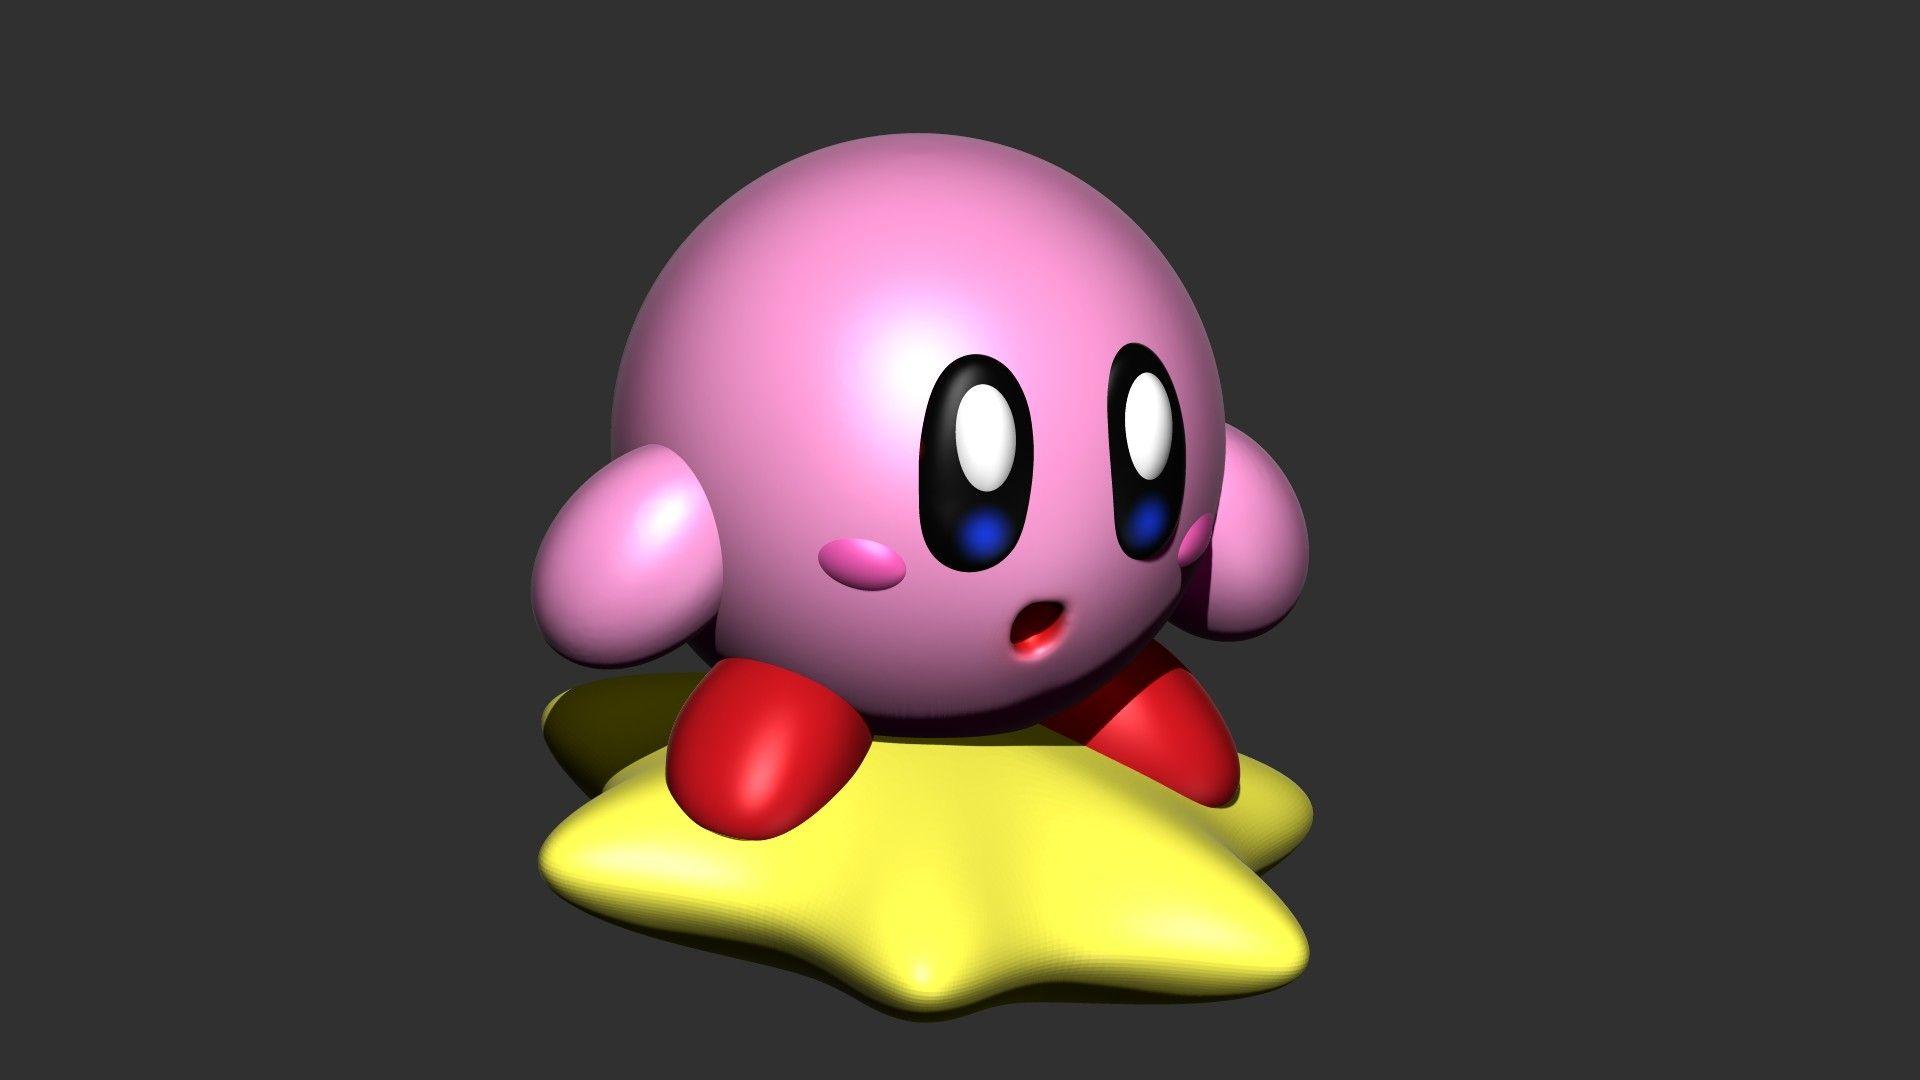 Kirby wallpaper image